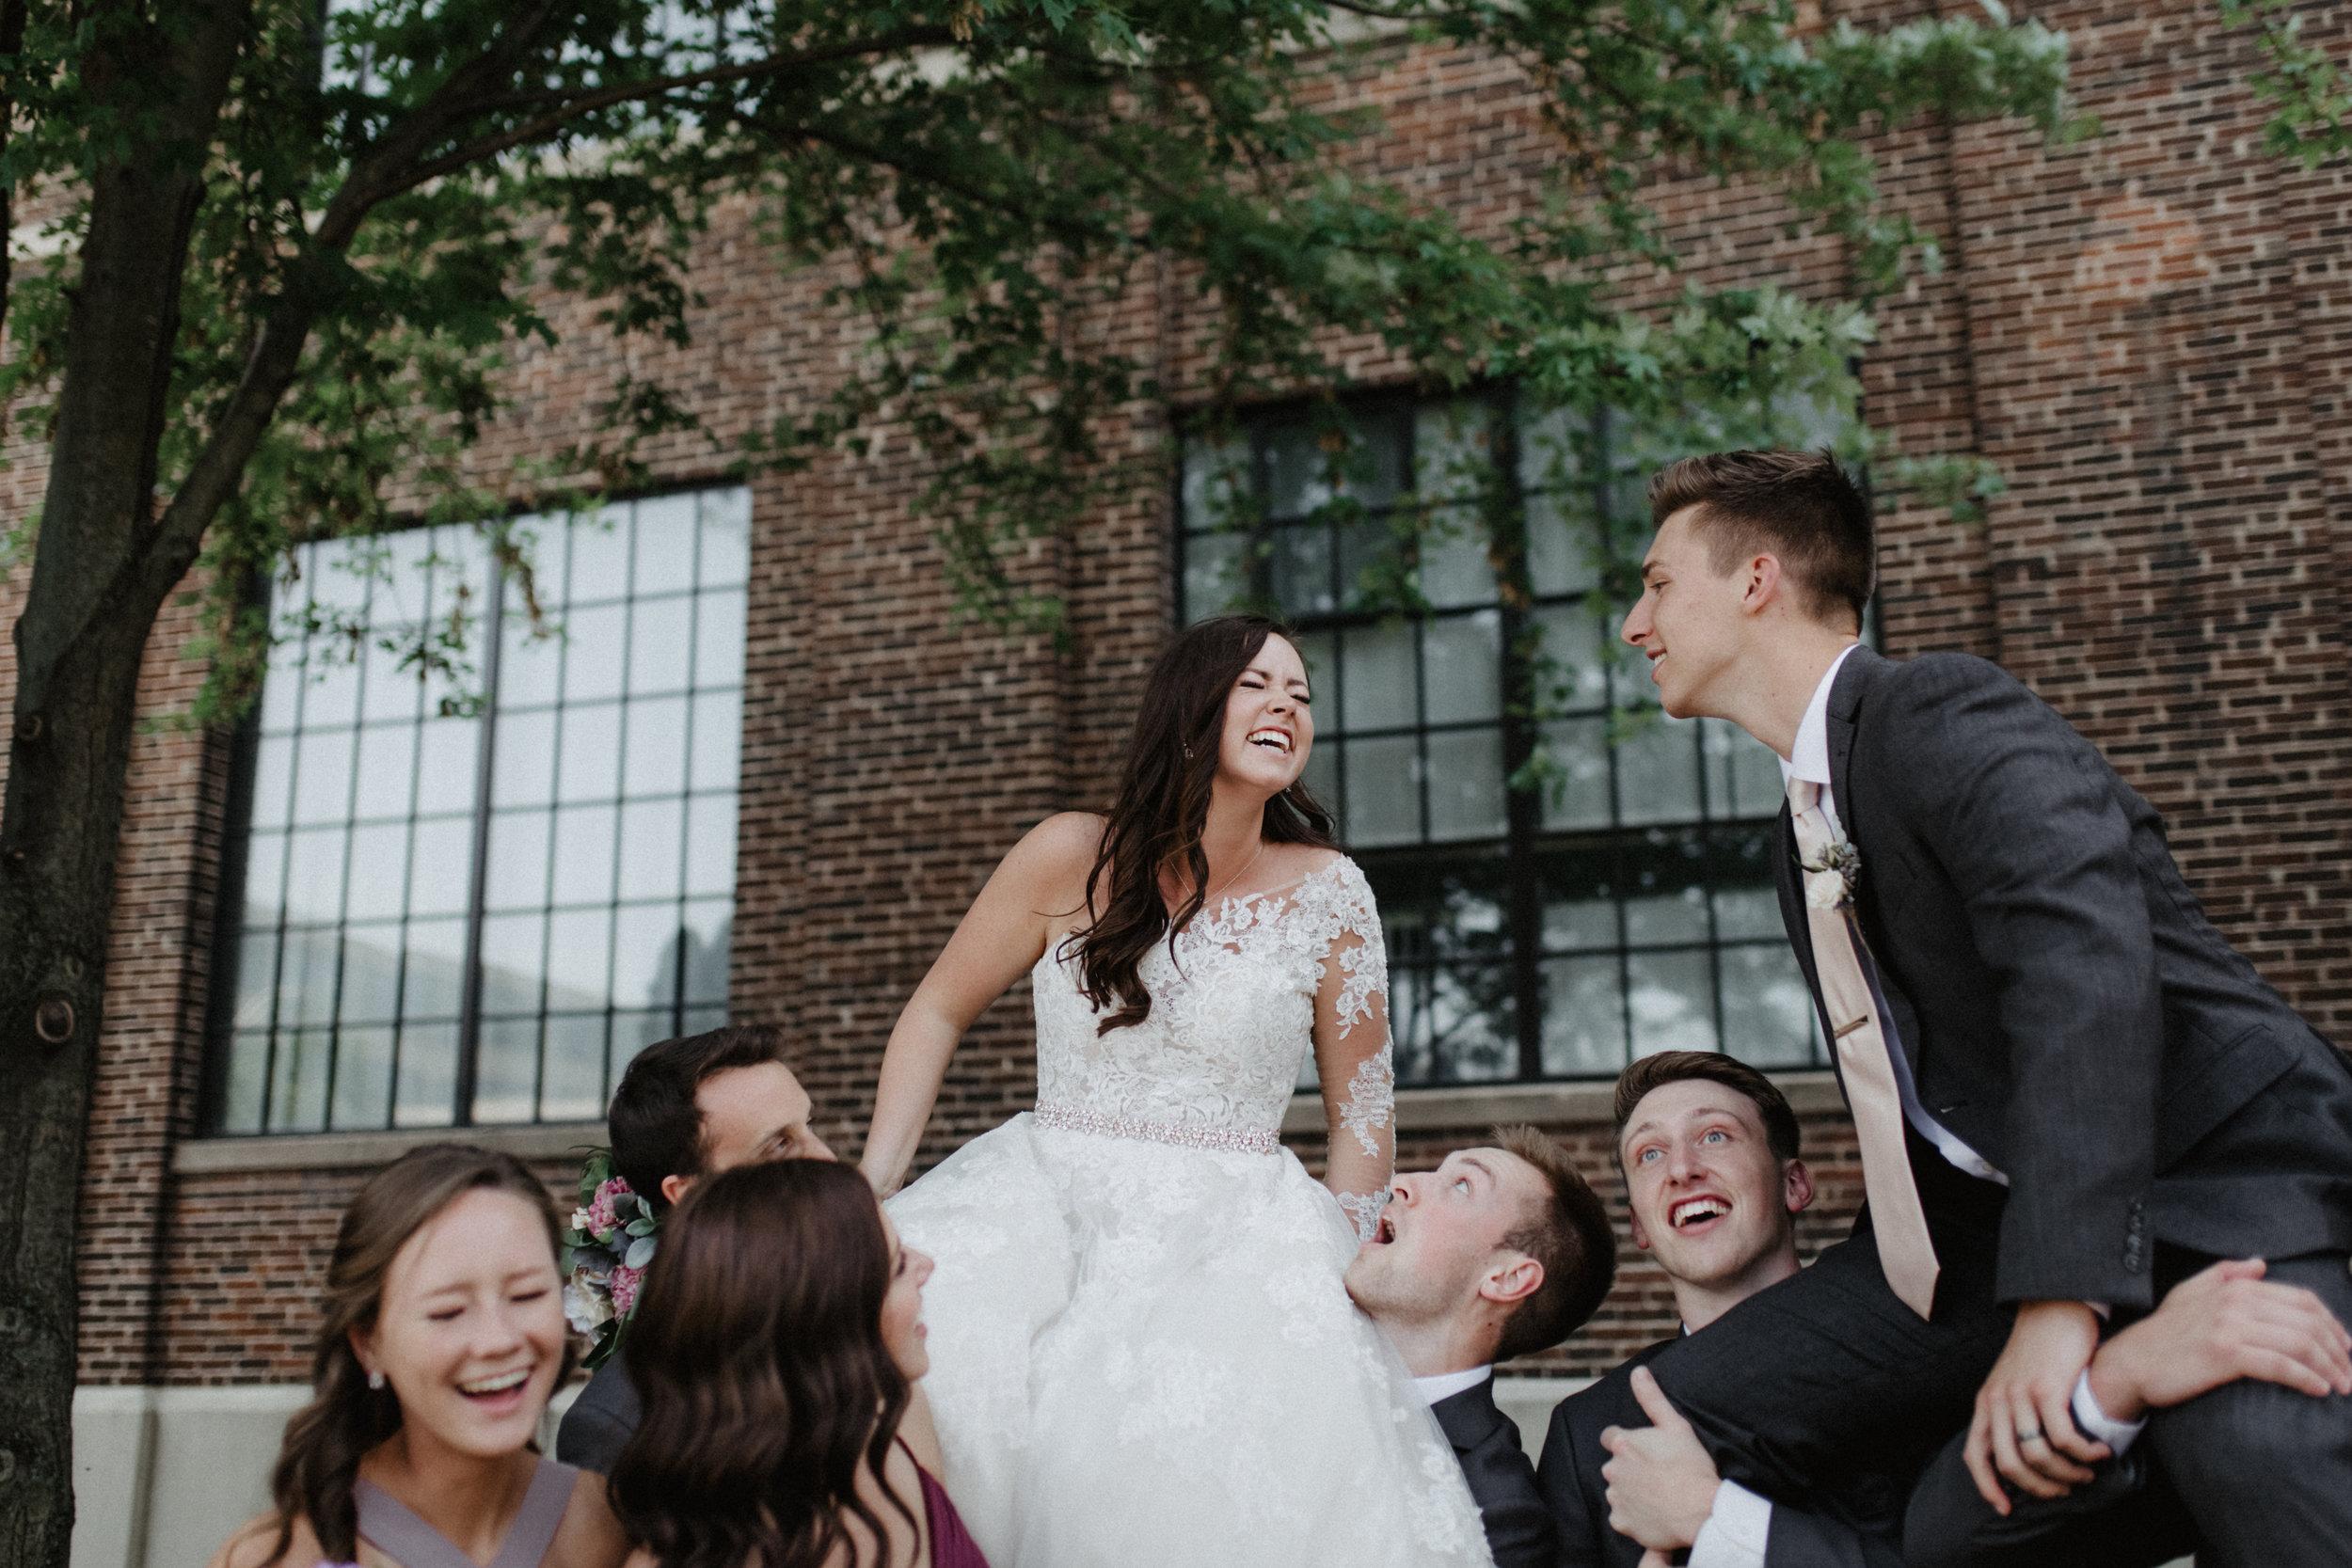 GRAYCENTOMHAMILTON-GRAND-RAPIDS-WEDDING-PHOTOGRAPHY-39.jpg